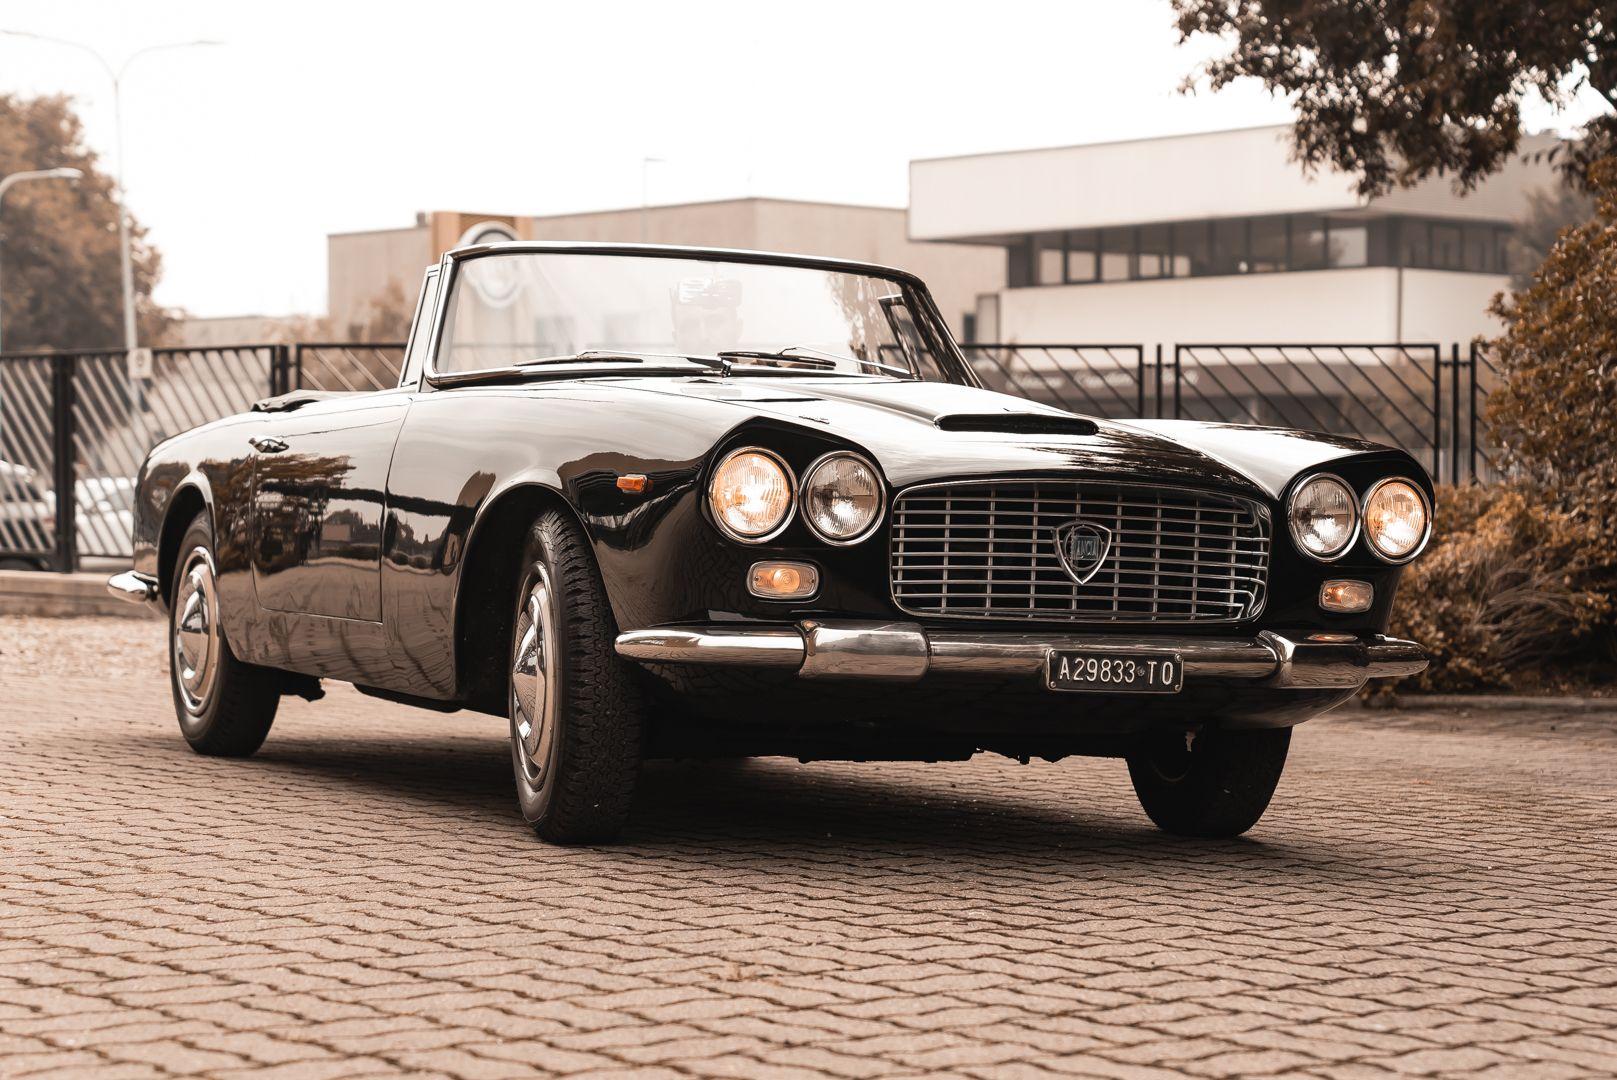 1968 Lancia Flaminia Touring Convertible 2800 3C 79173